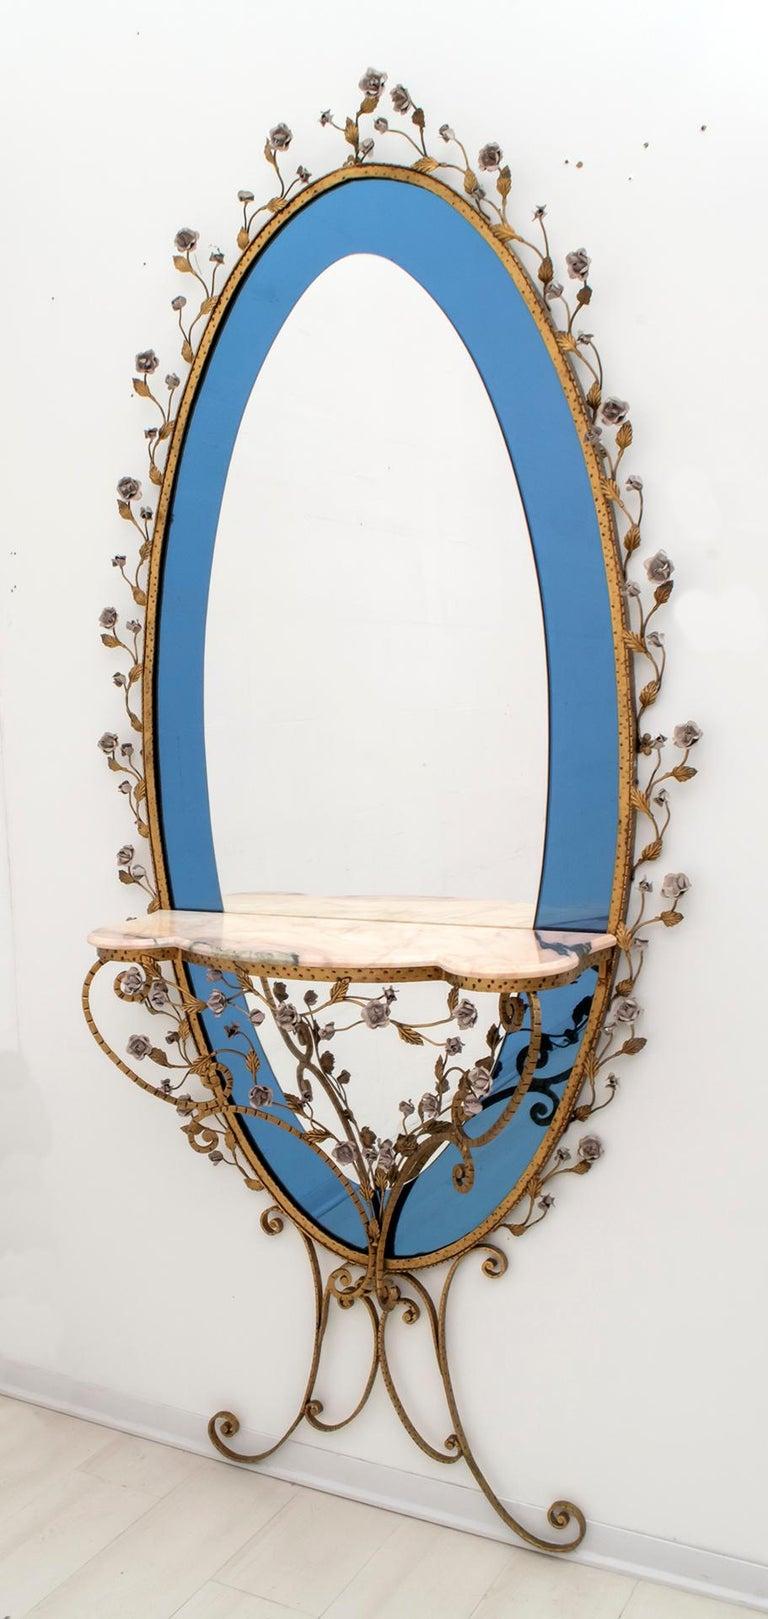 Pier Luigi Colli Mid-Century Modern Italian Wrought Iron Hallway Mirror, 1950s In Good Condition For Sale In Cerignola, Italy Puglia